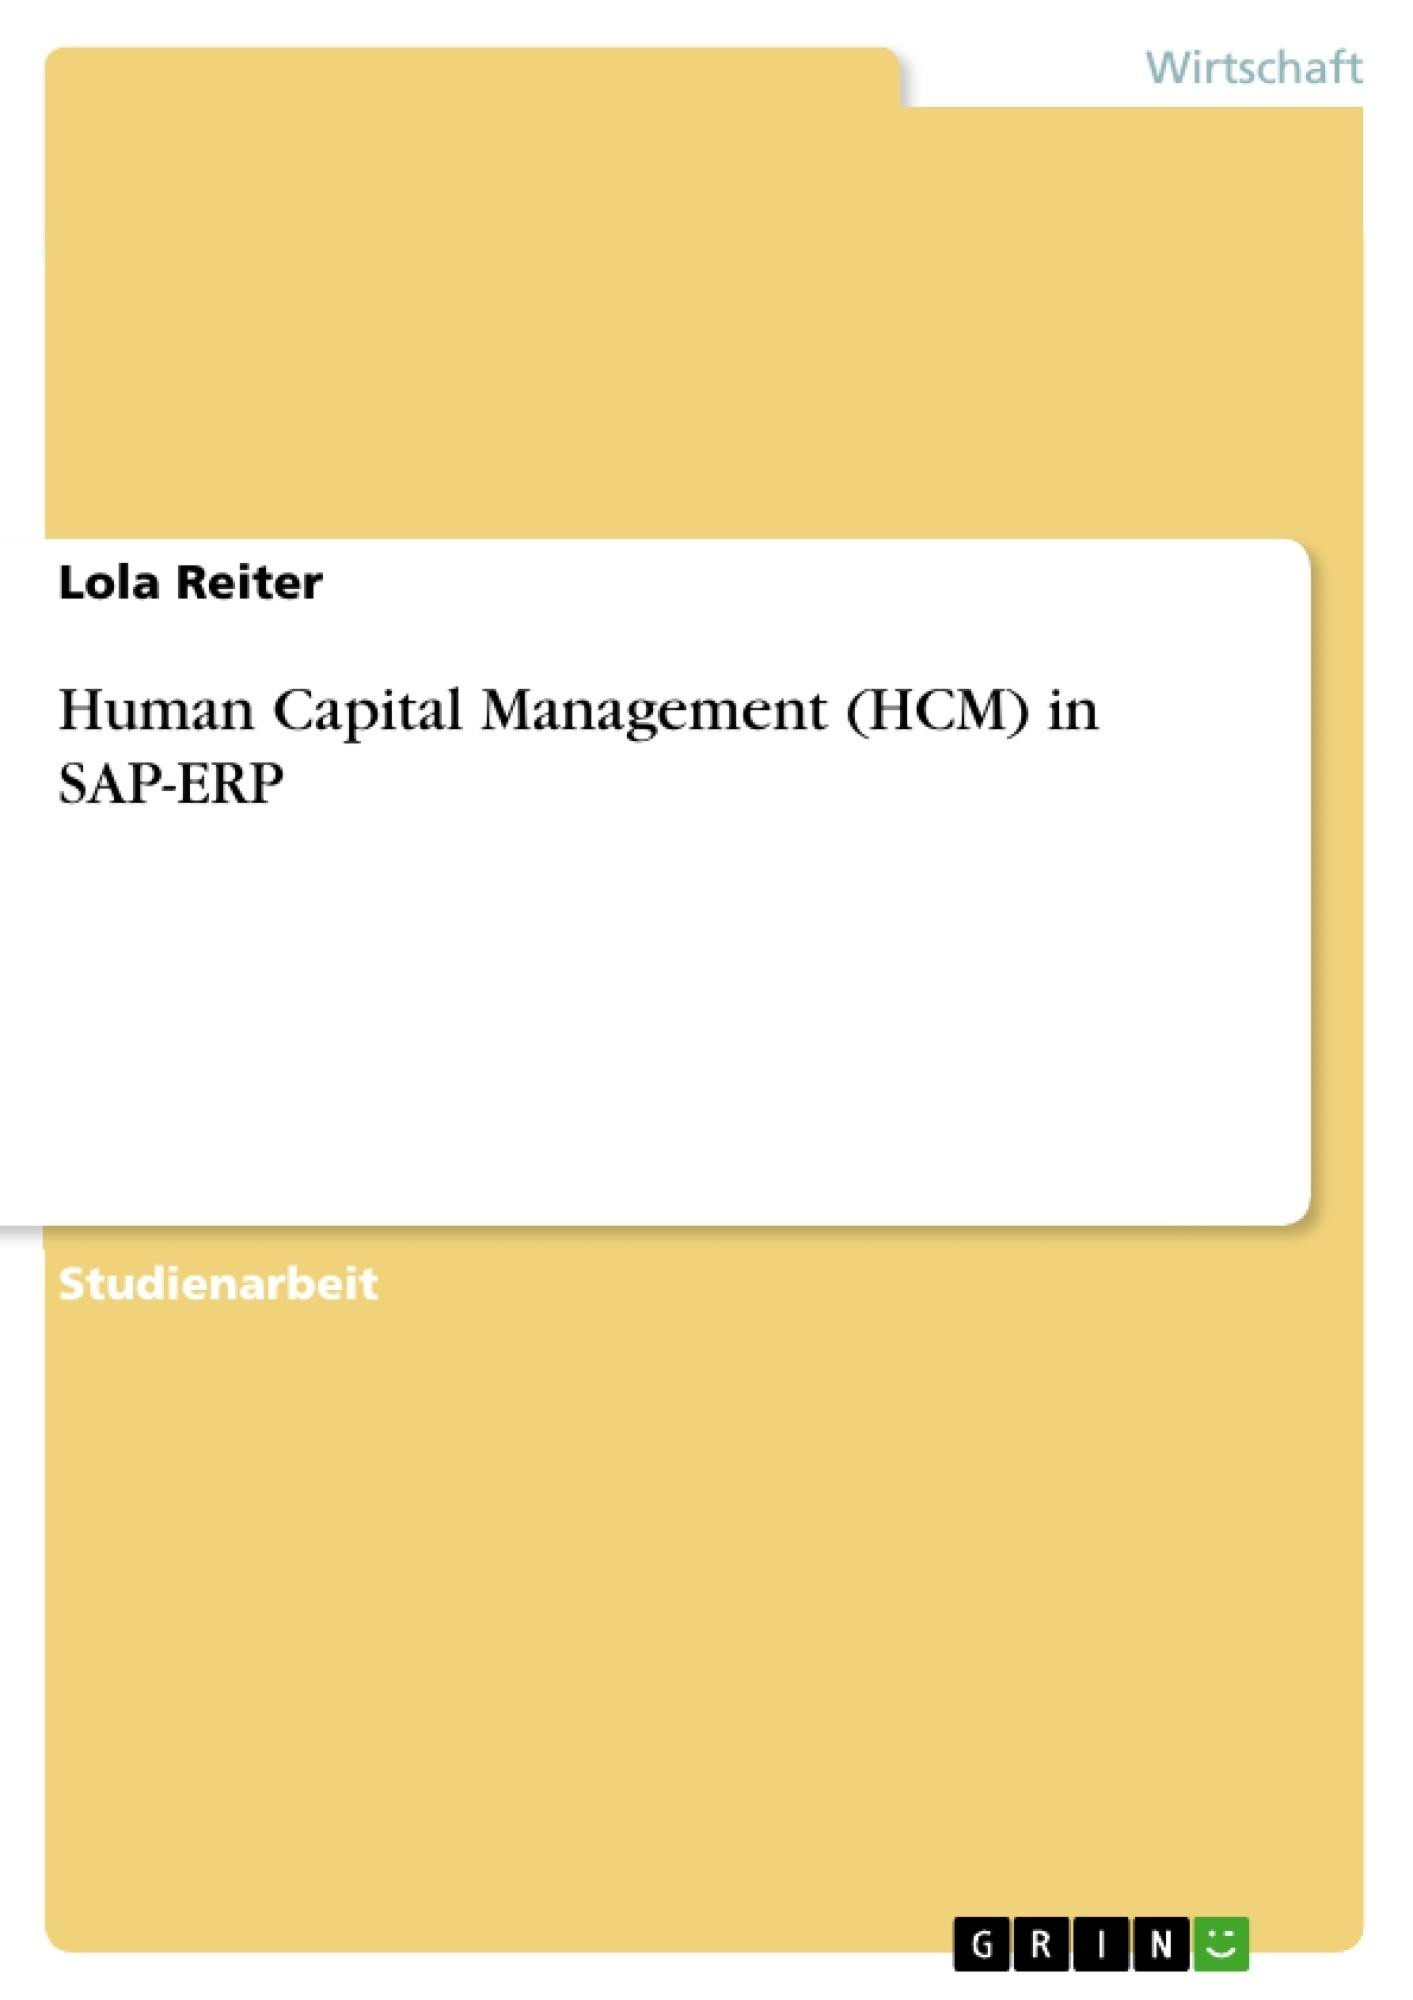 Titel: Human Capital Management (HCM) in SAP-ERP